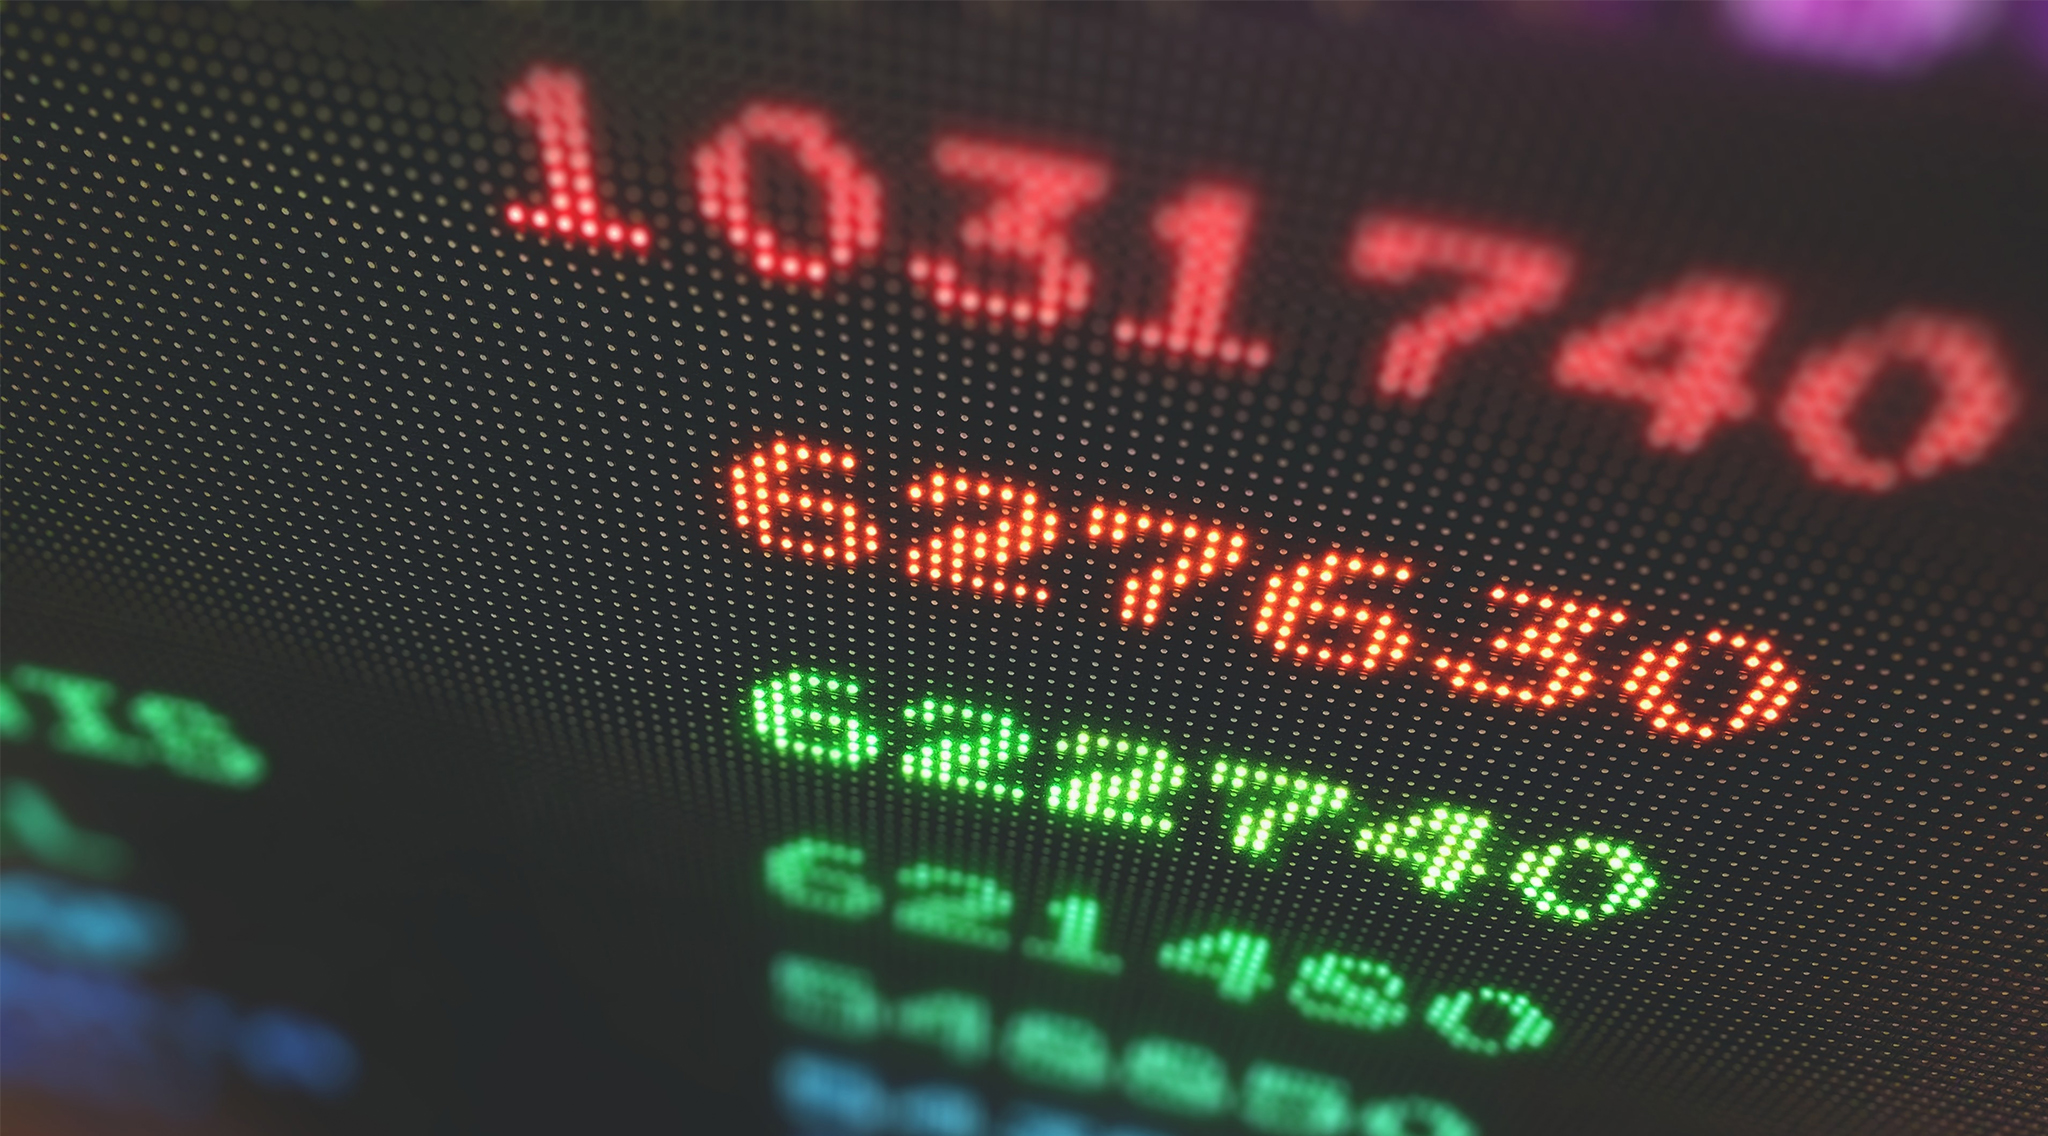 VanEck listet Krypto-ETPs an der SIX Swiss Exchange